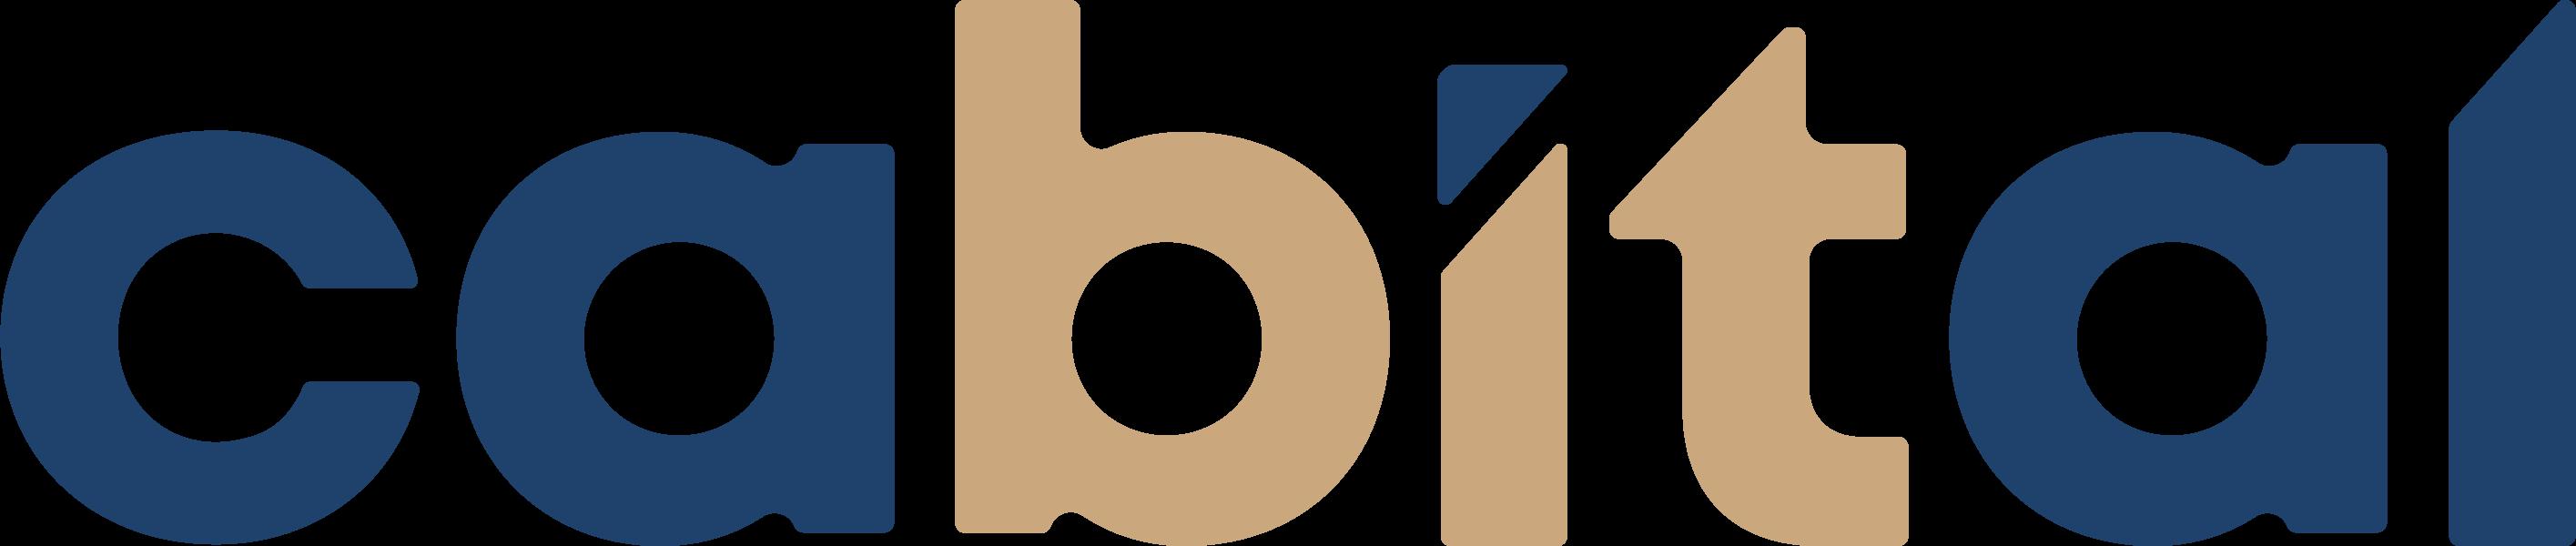 Cabital Logo